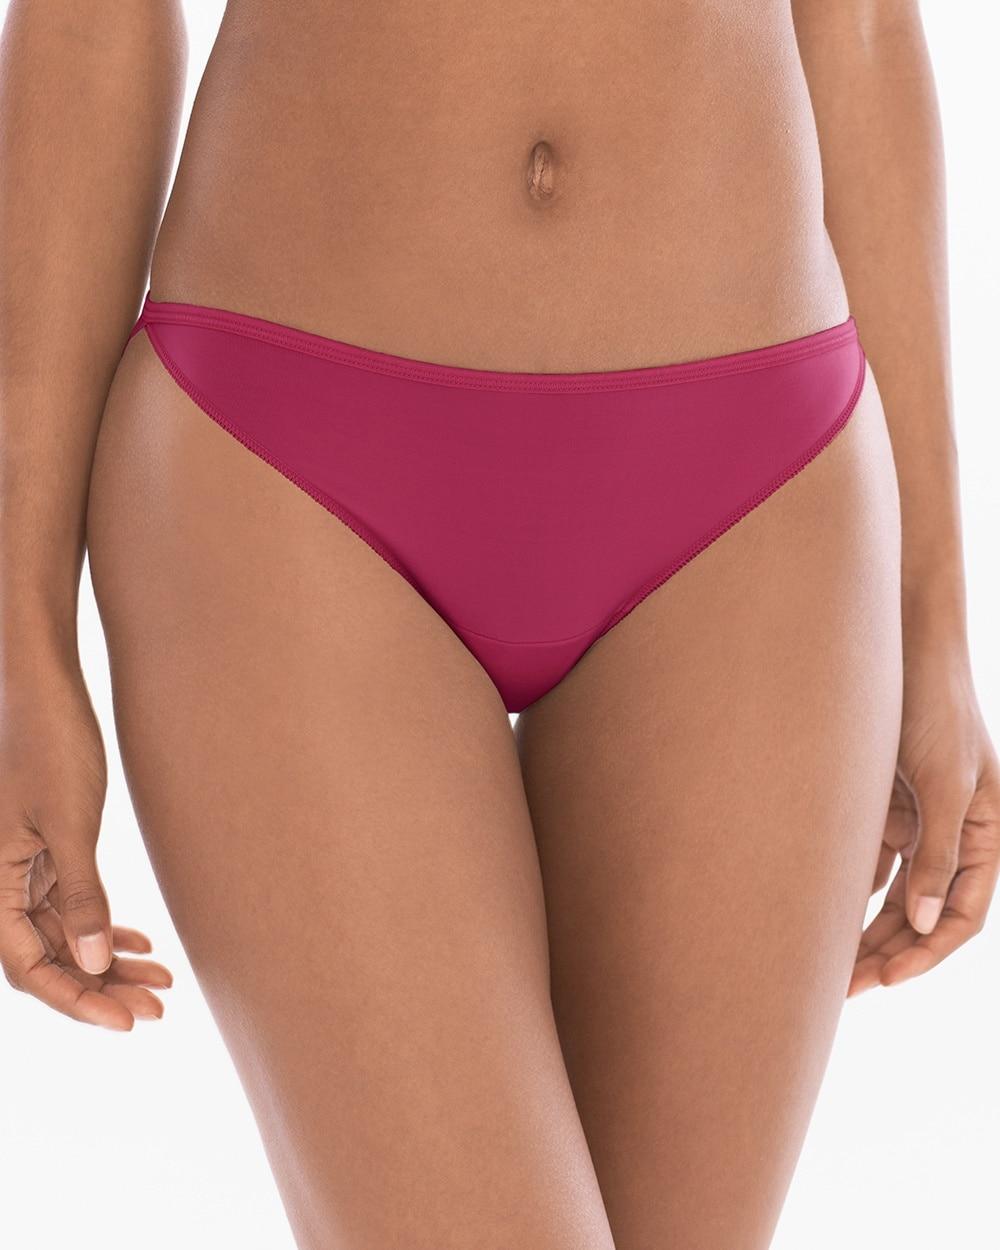 5a1f1a1f3a Shop Women s Panties   Underwear - Soma